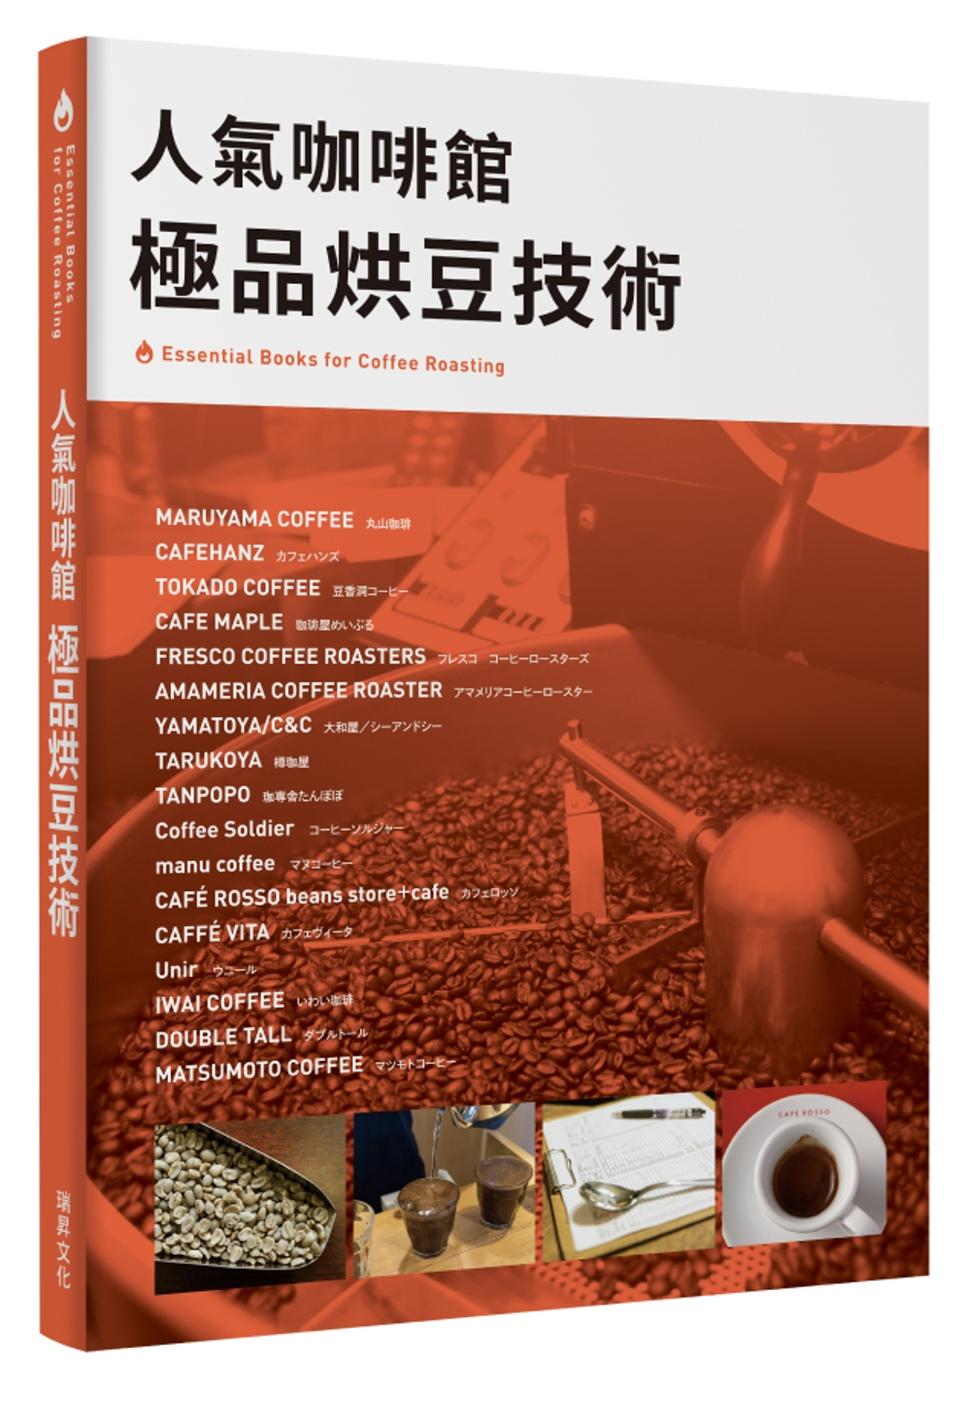 人氣咖啡館 極品烘豆技術:Essential Books for Coffee Roasti 人氣烘豆師的烘焙技術和理念